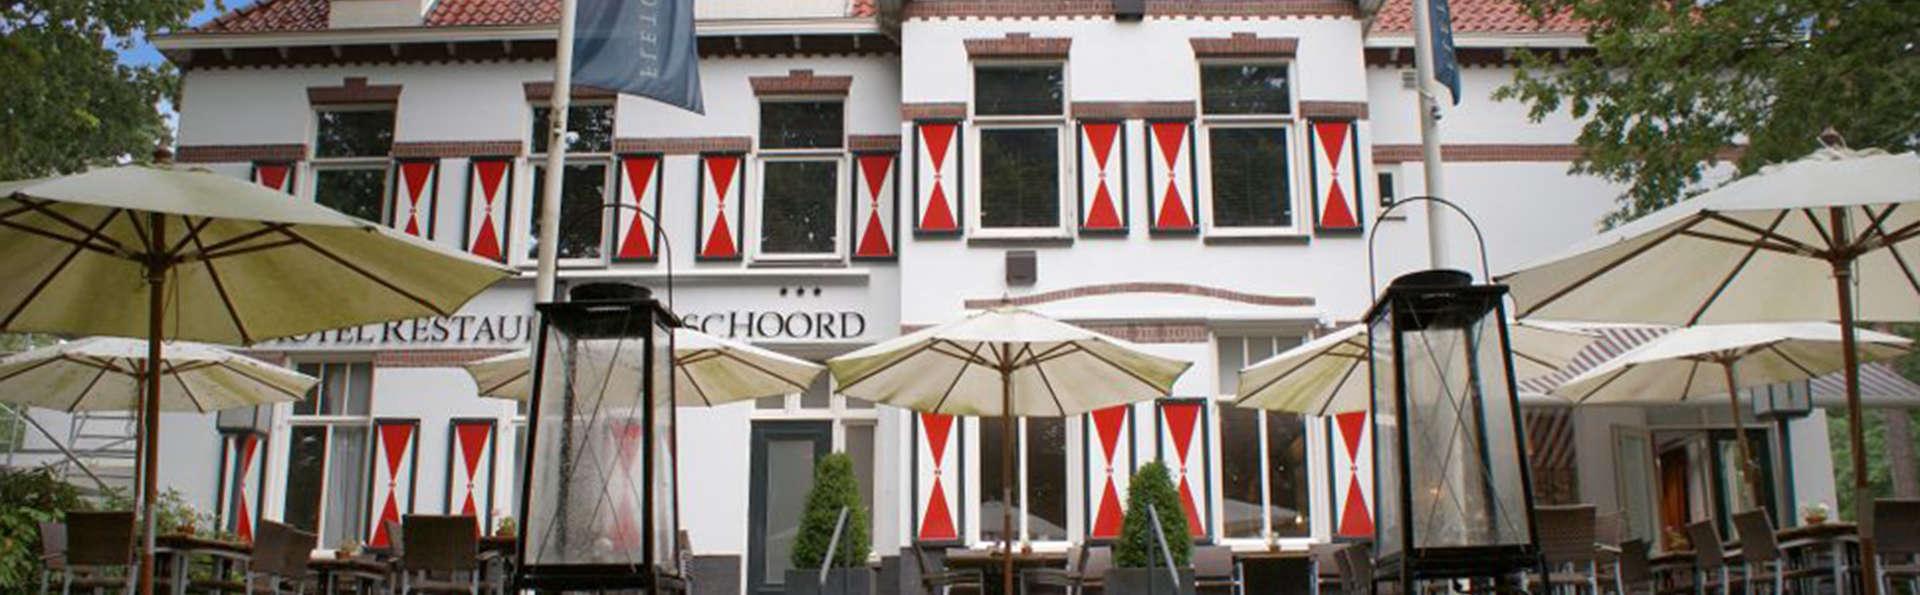 Fletcher Hotel-Restaurant Boschoord - EDIT_front.jpg